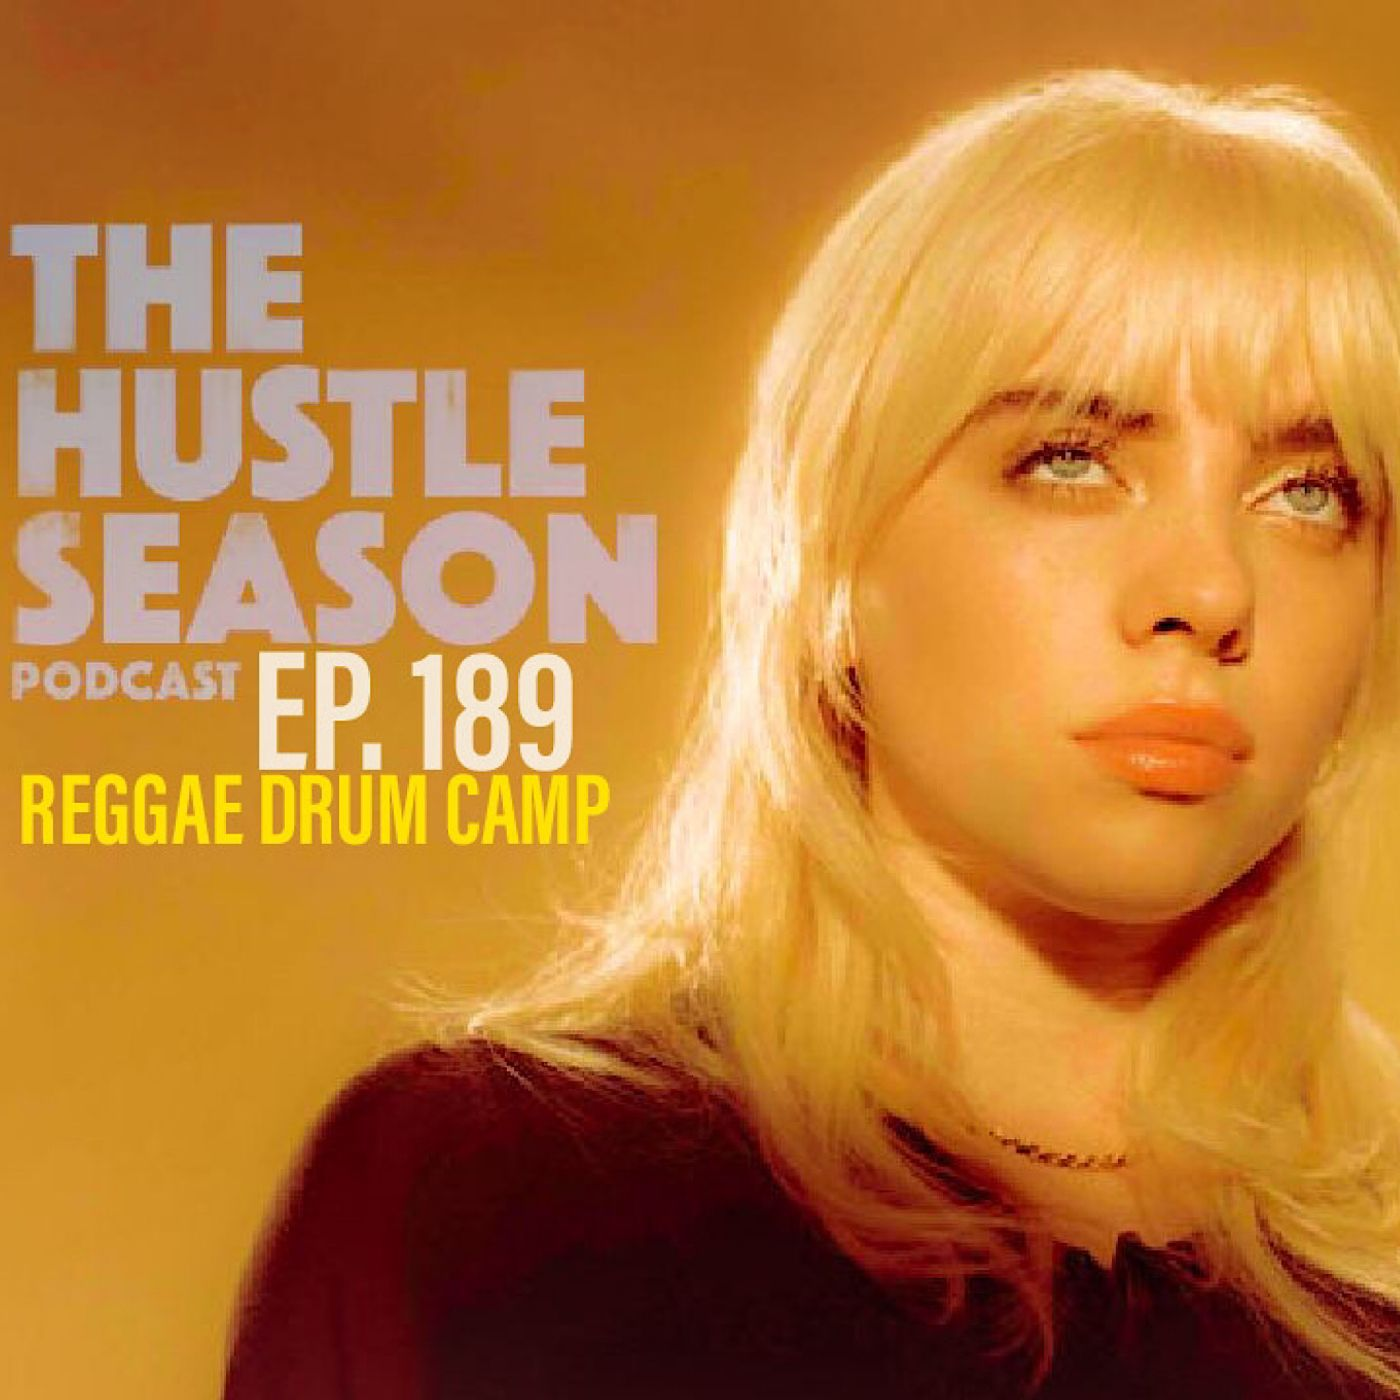 The Hustle Season: Ep. 189 Reggae Drum Camp